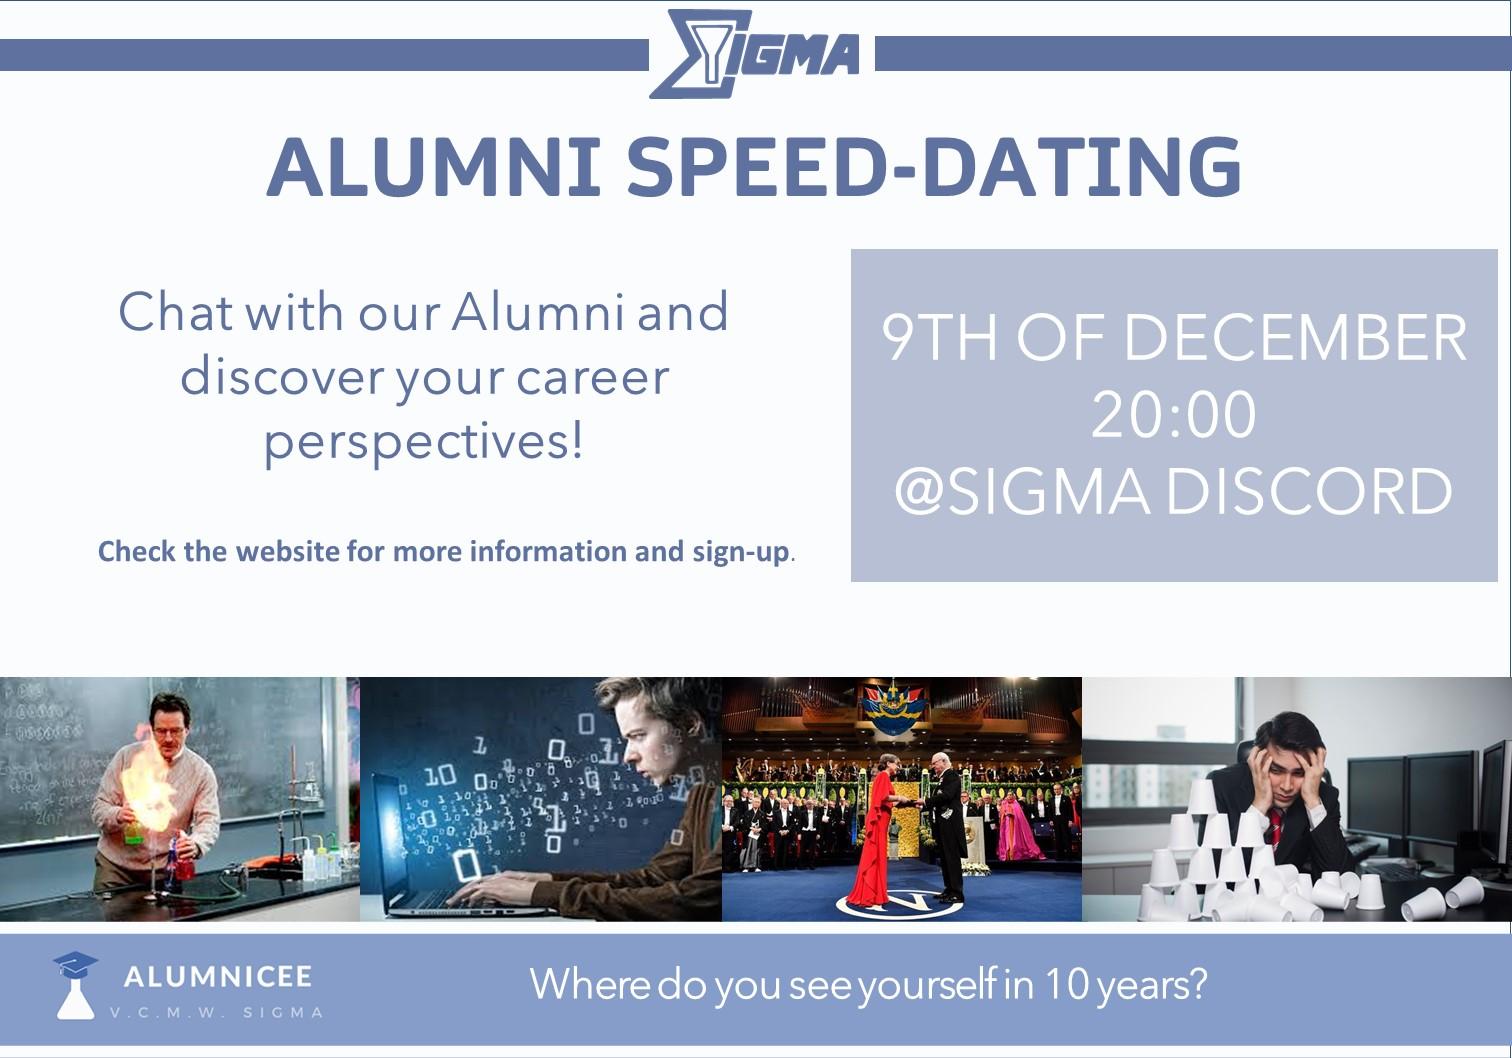 Alumni Speed-Dating